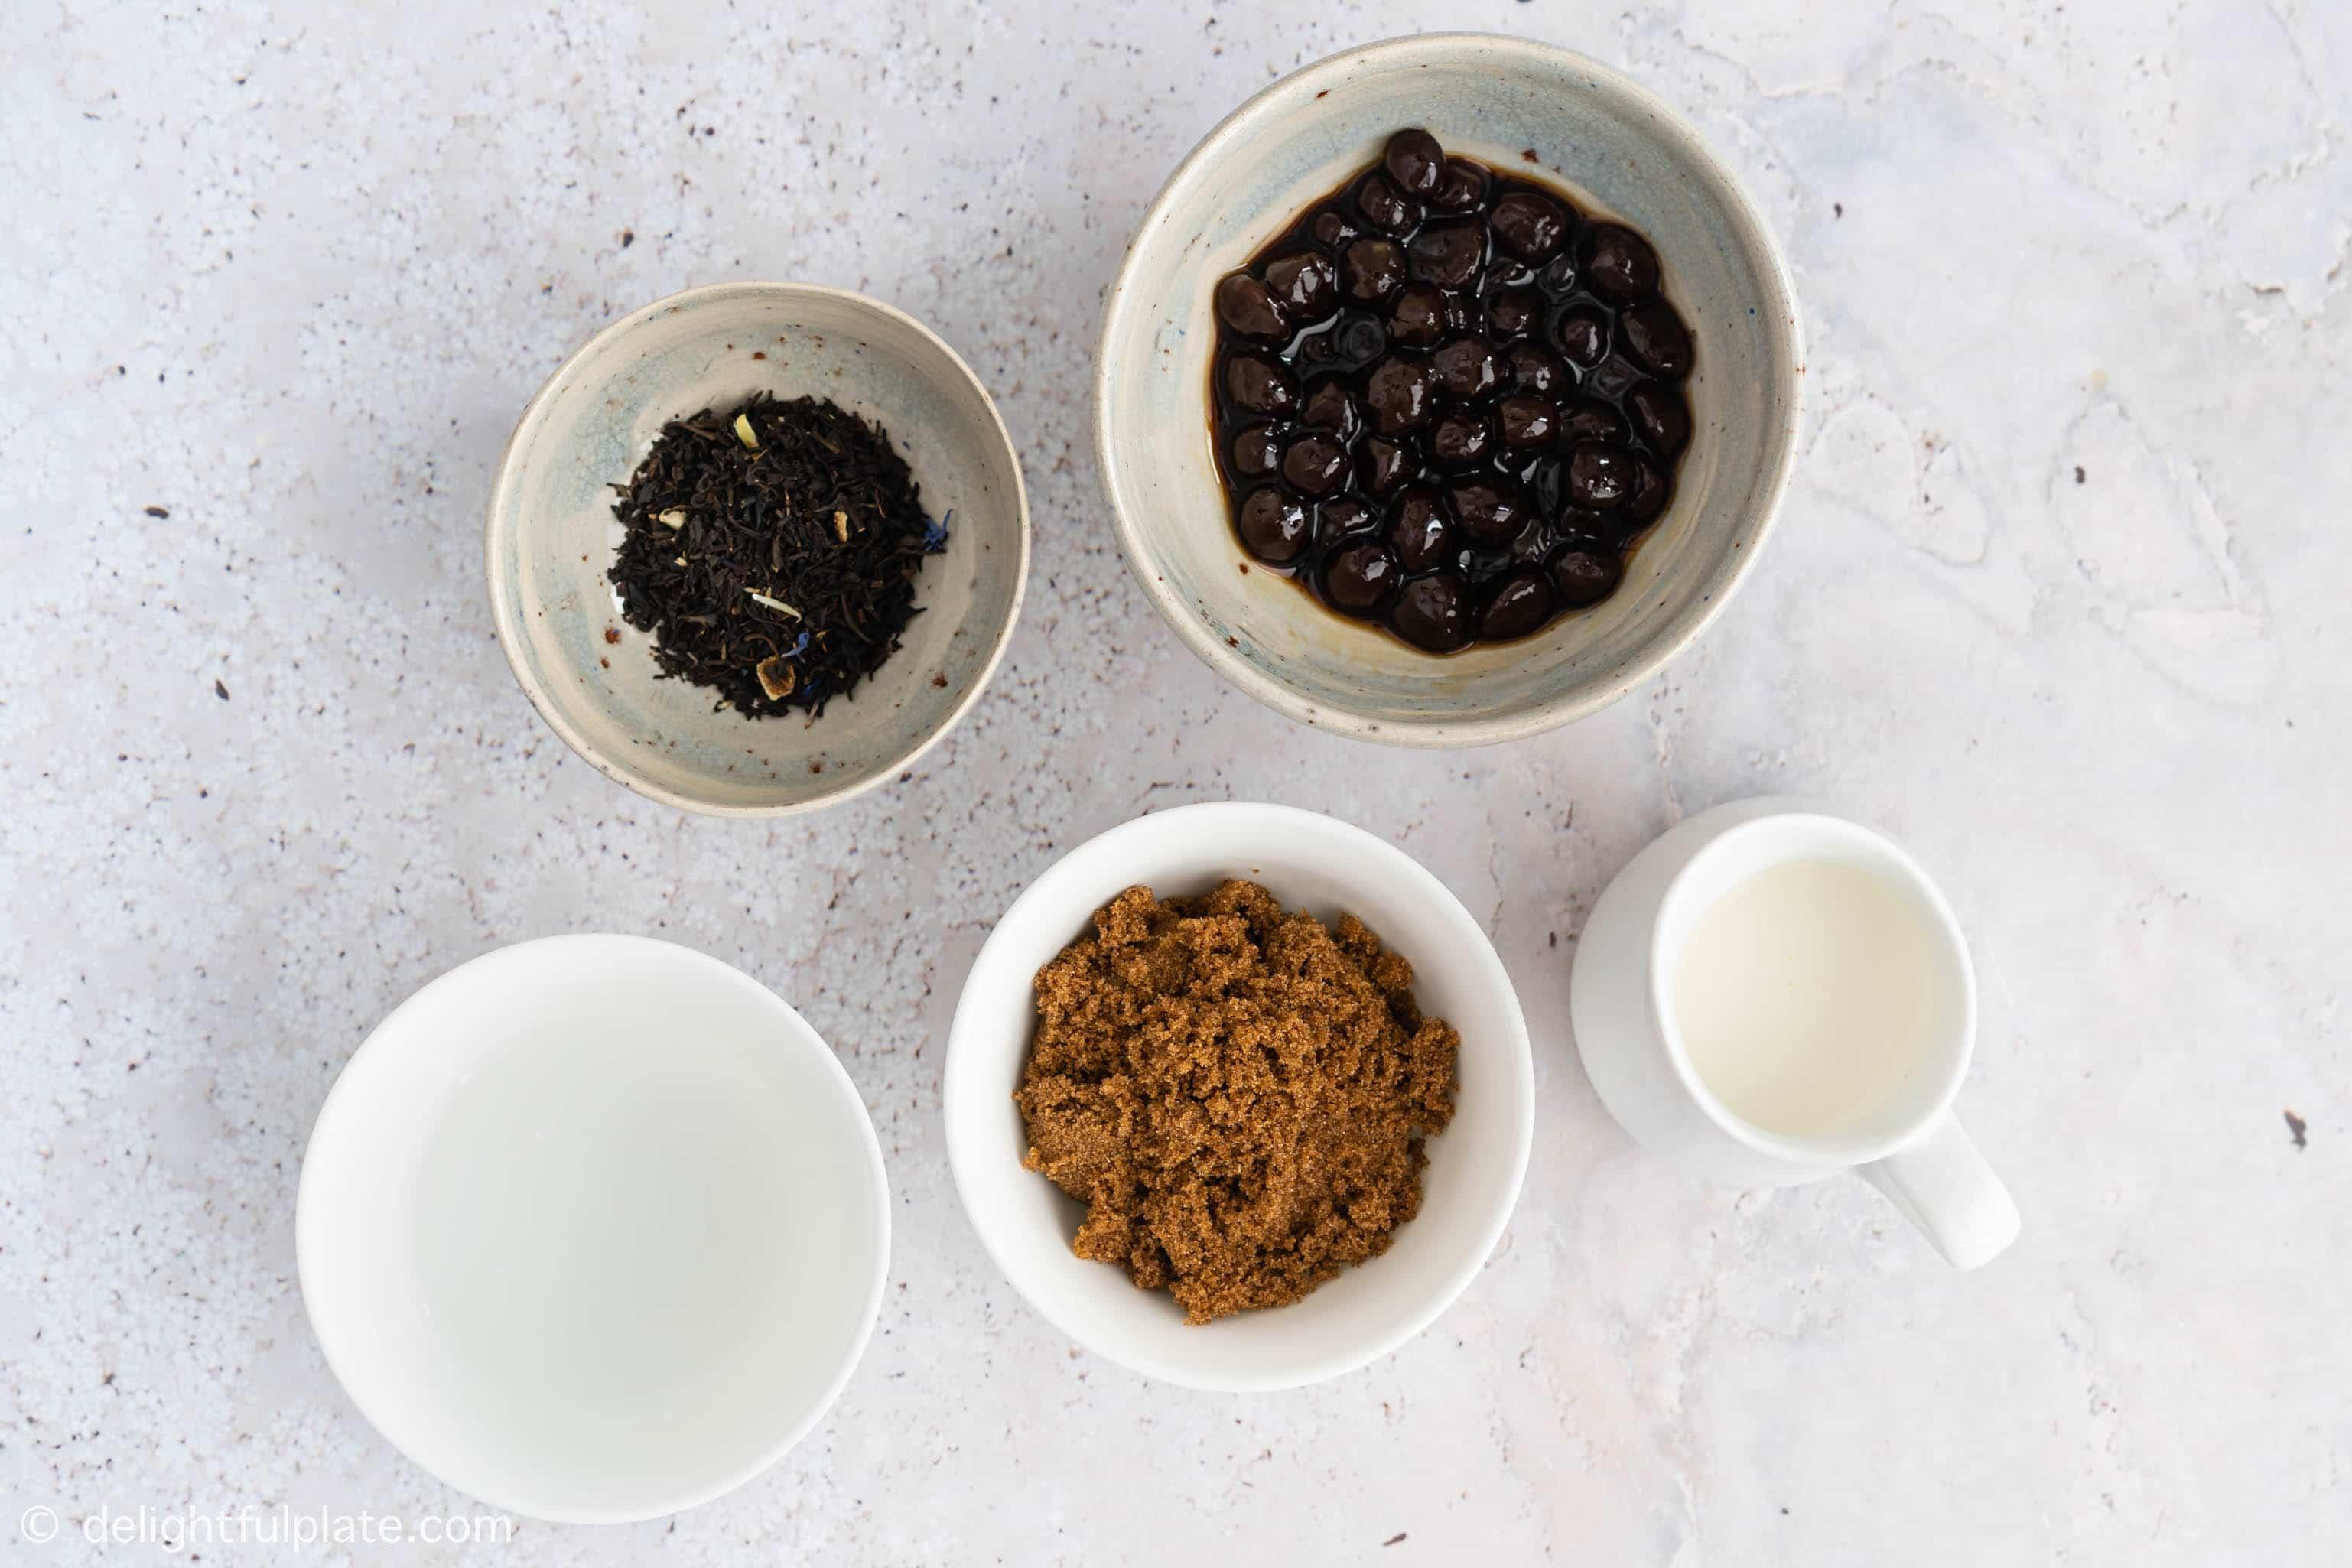 Ingredients for bubble milk tea